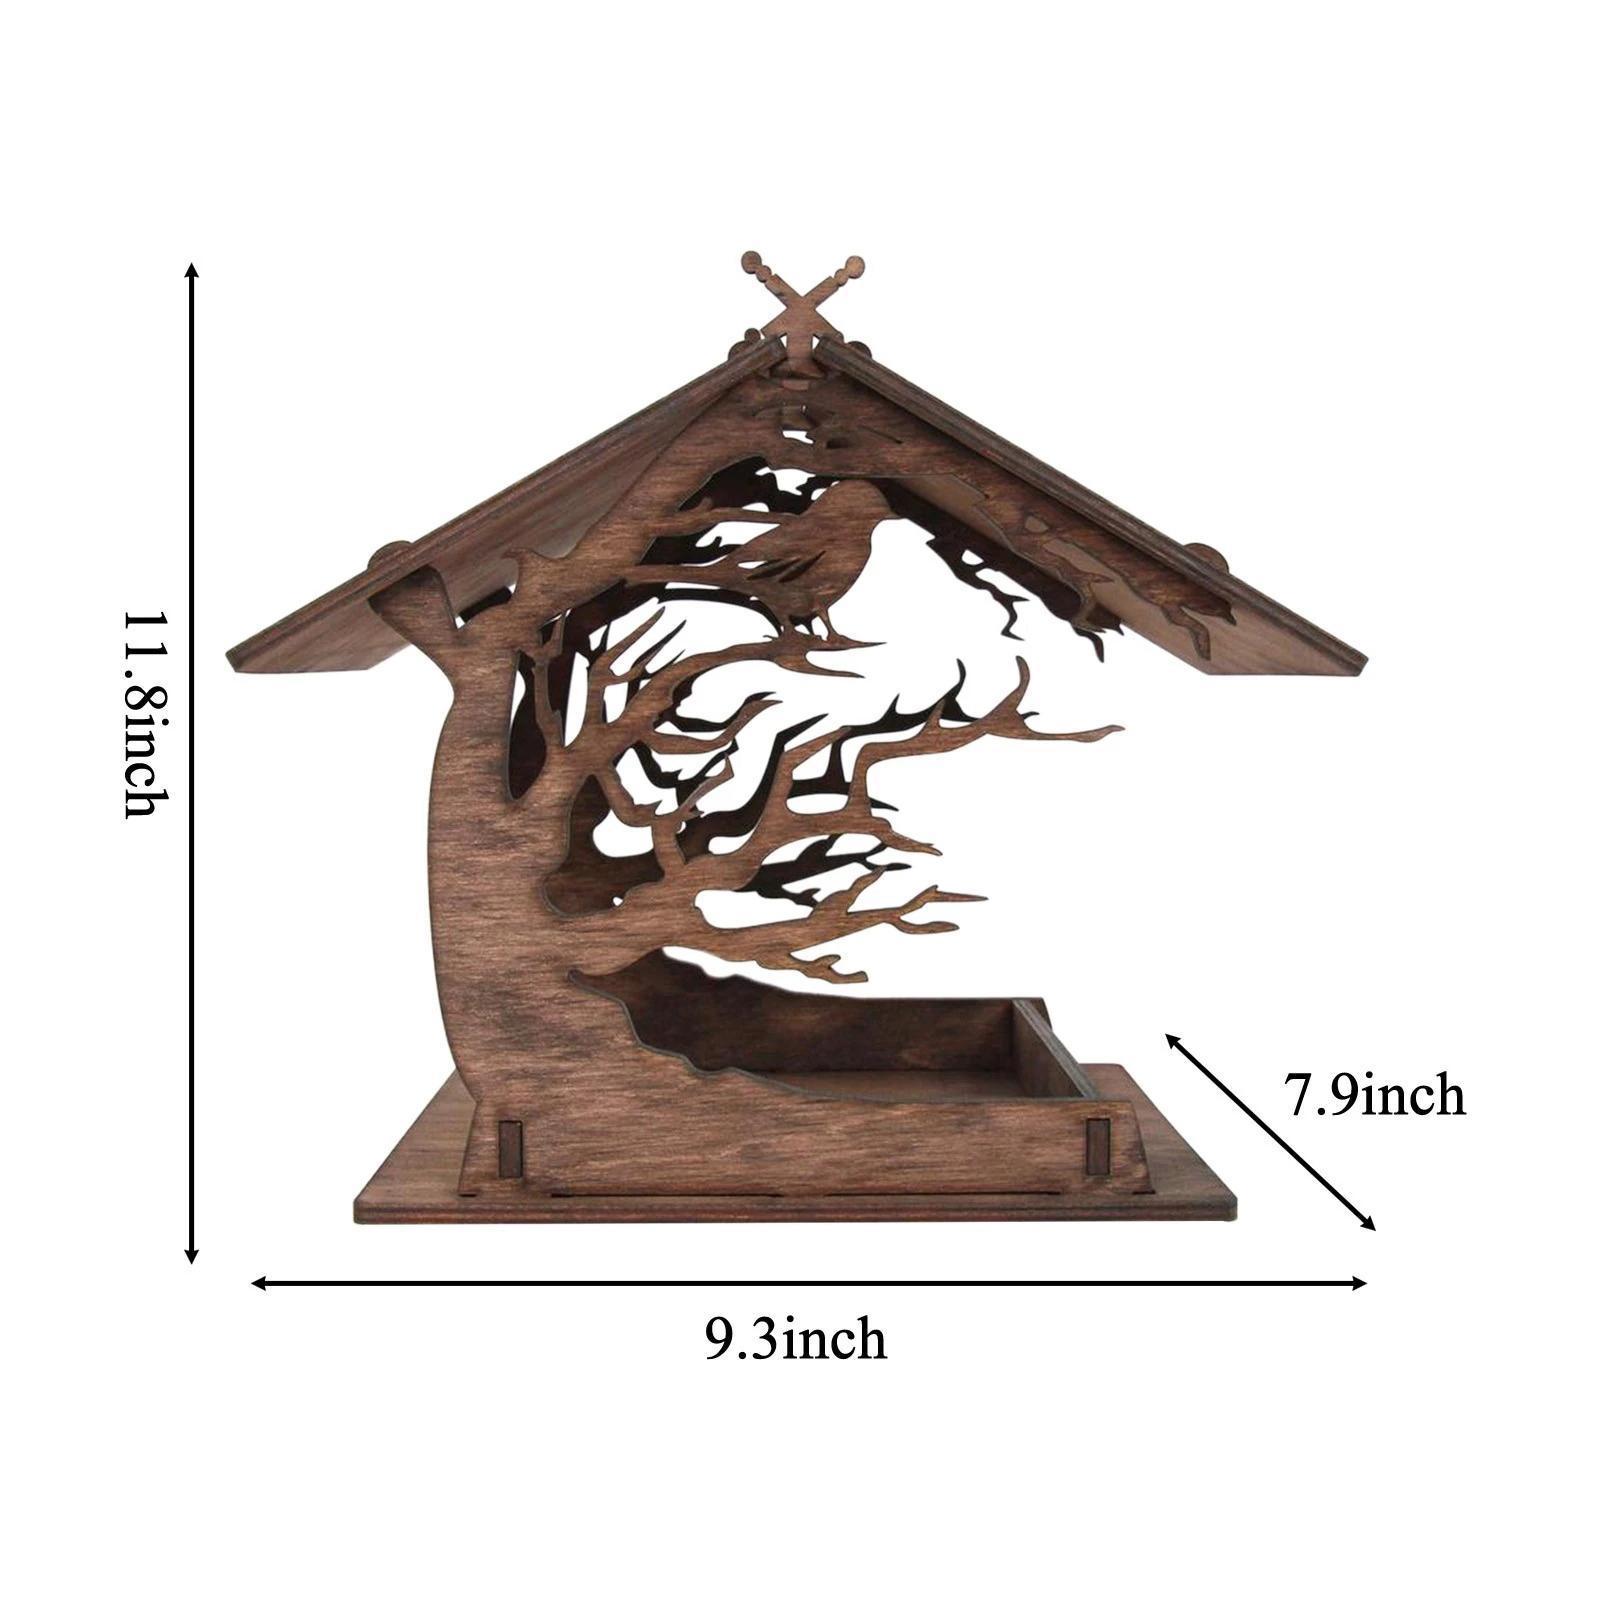 thumbnail 6 - Wooden Bird Feeder Balcony Ranch Decoration Ornaments Wildbird Essentials